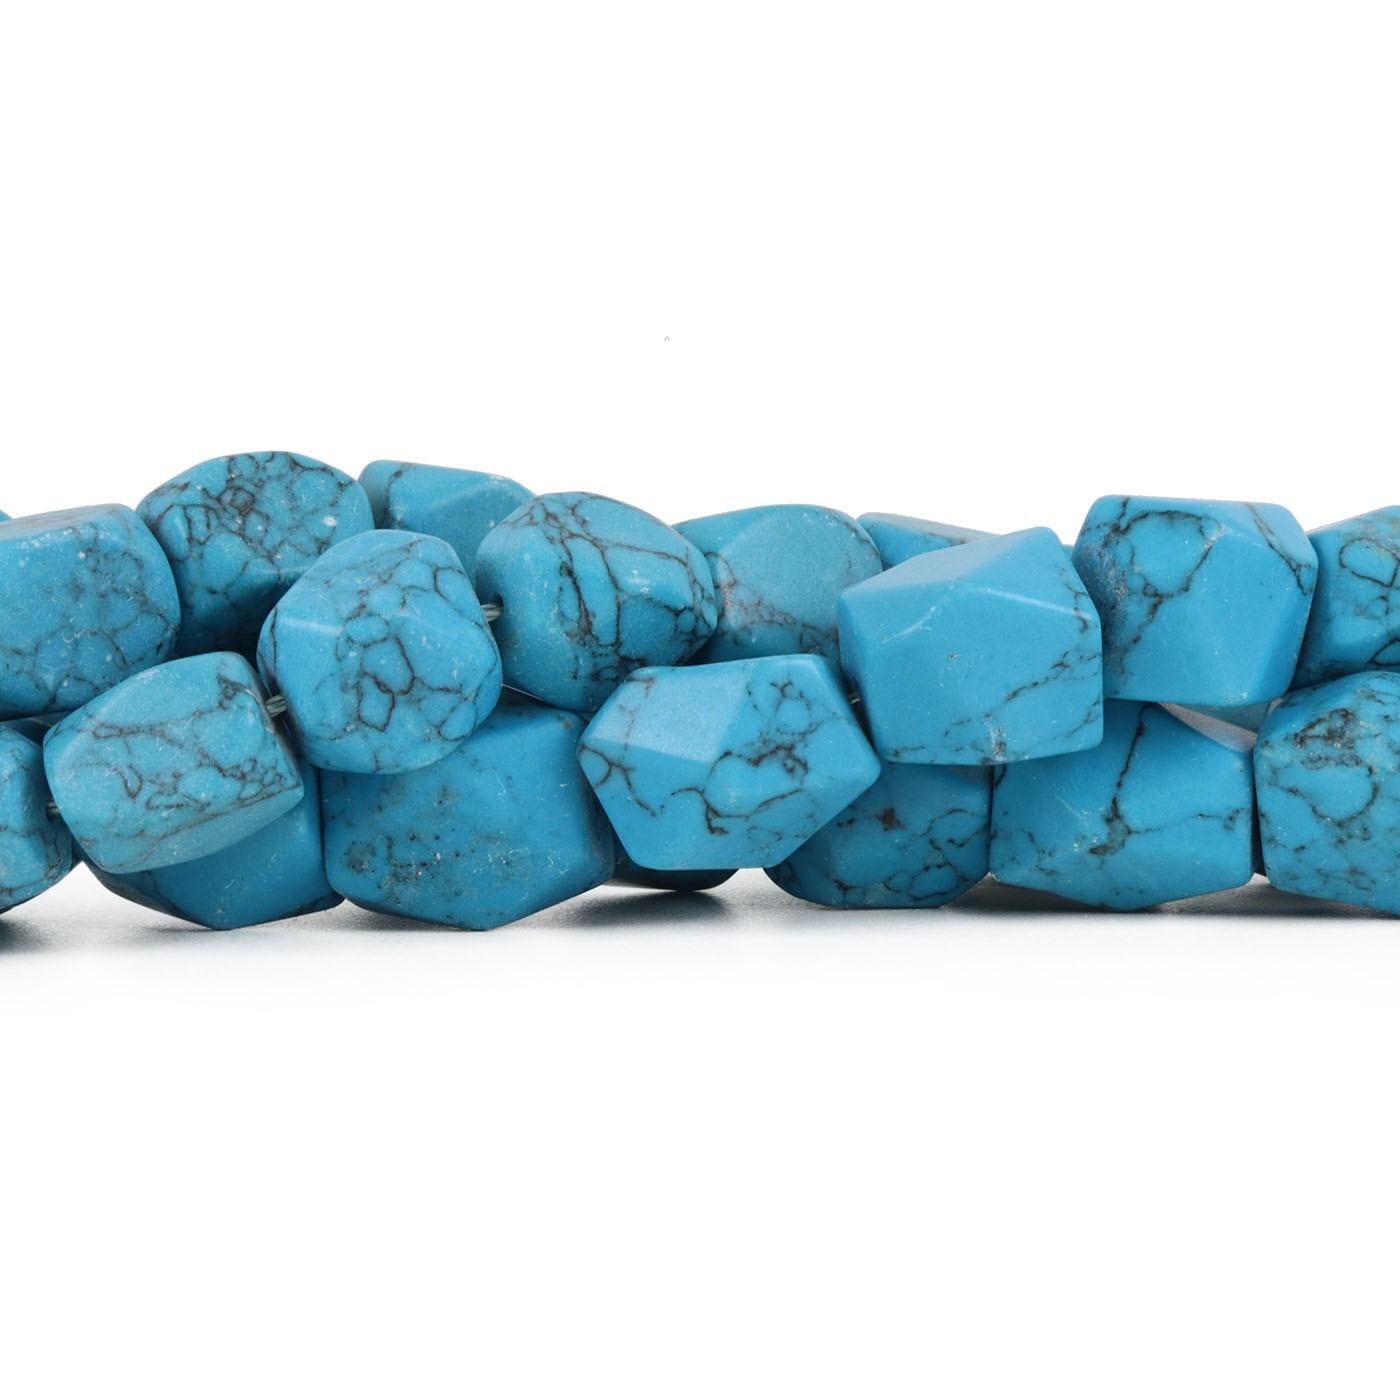 Fio de Howlita Azul Rajada Chanfrada - RO040  - ArtStones